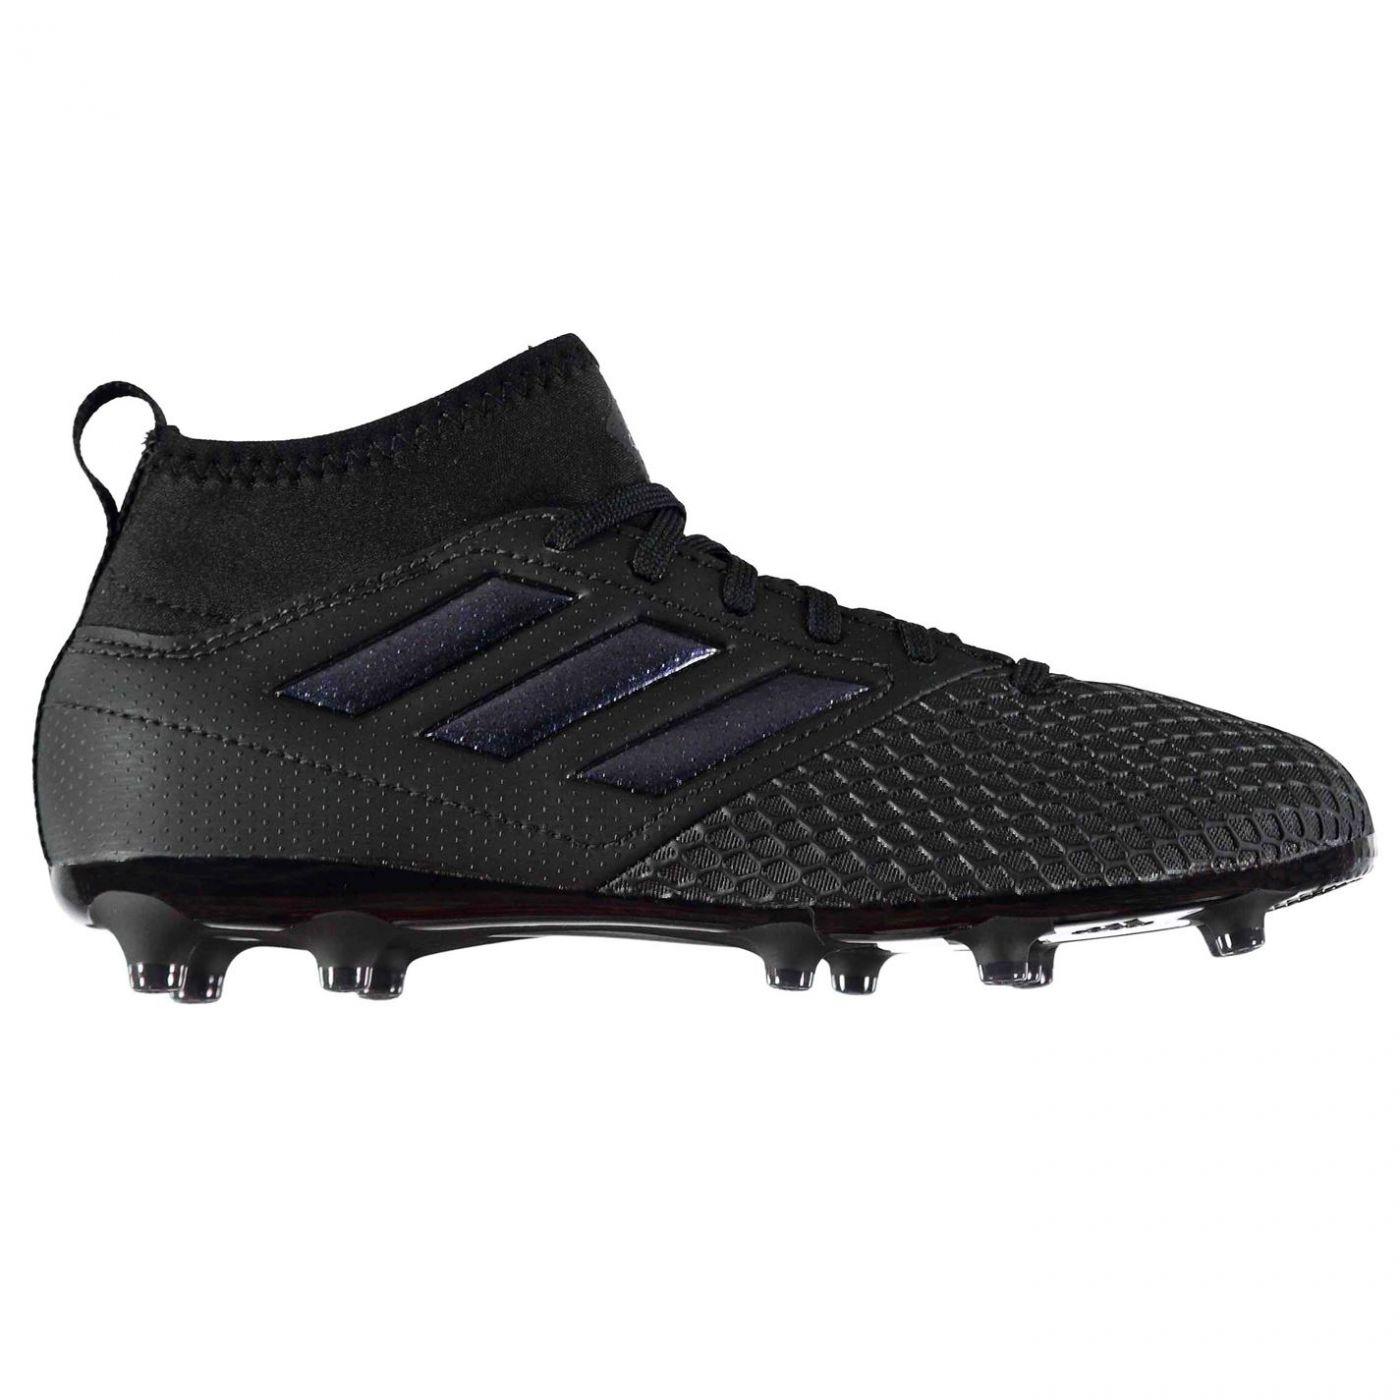 Adidas Ace 17.3 Primemesh FG Junior Football Boots